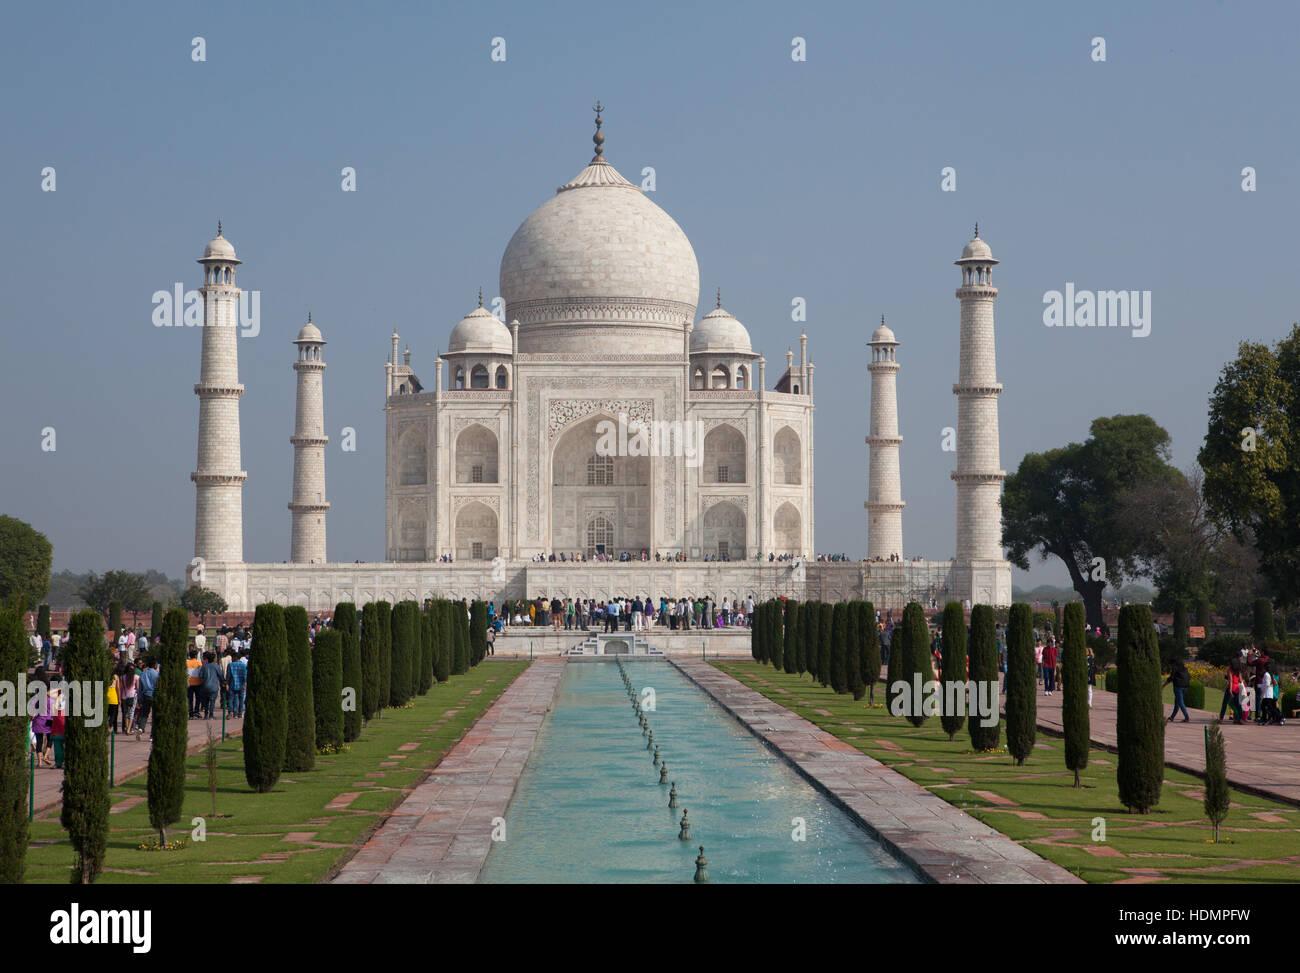 Das Taj Mahal-Mausoleum, Südansicht, Uttar Pradesh, Indien Stockbild